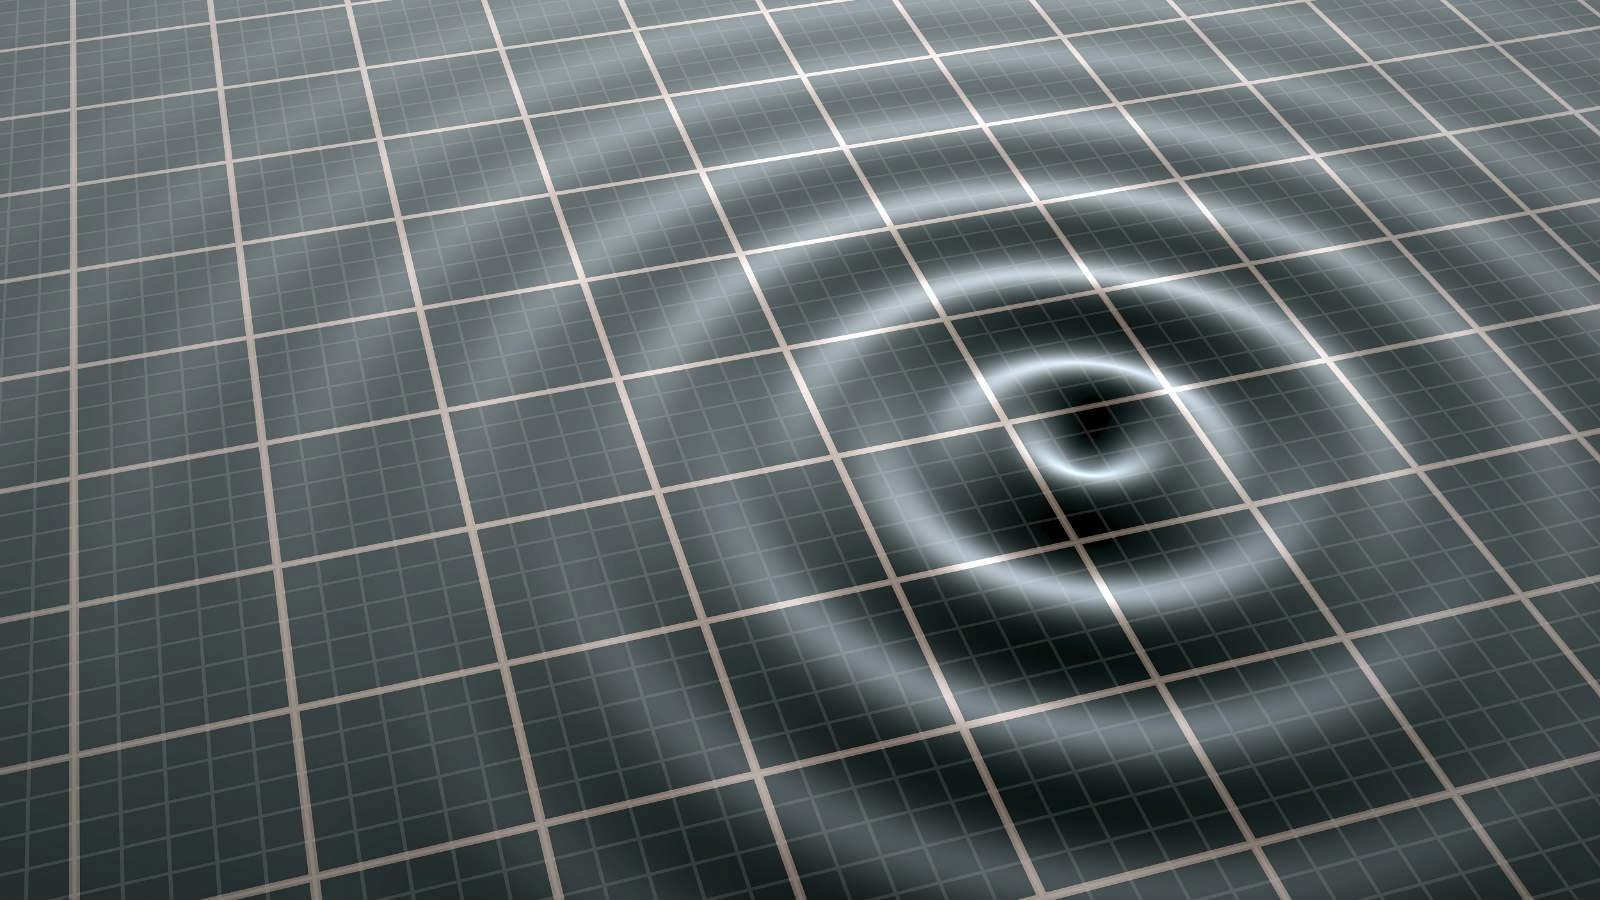 5.2-magnitude quake hits waters off eastern Taiwan